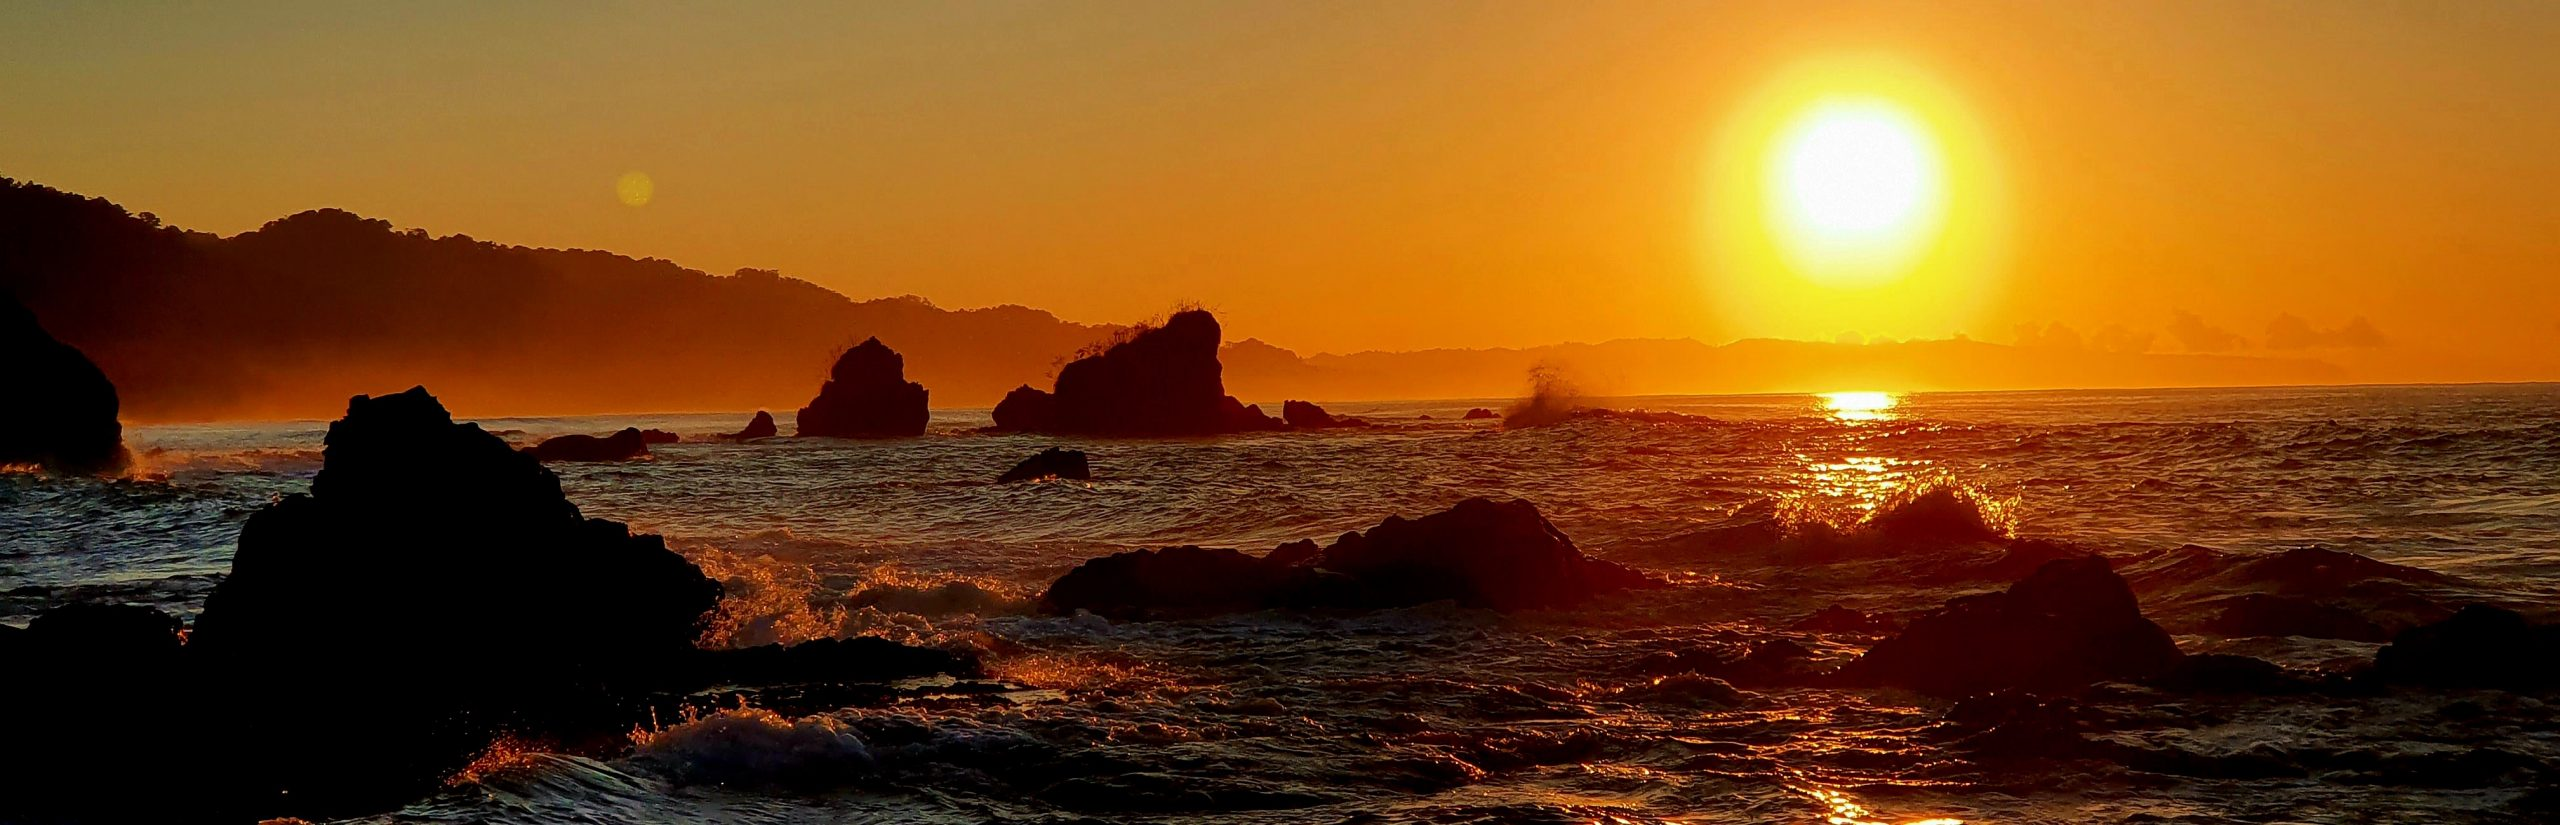 Sunset beach Osa Peninsula Costa Rica